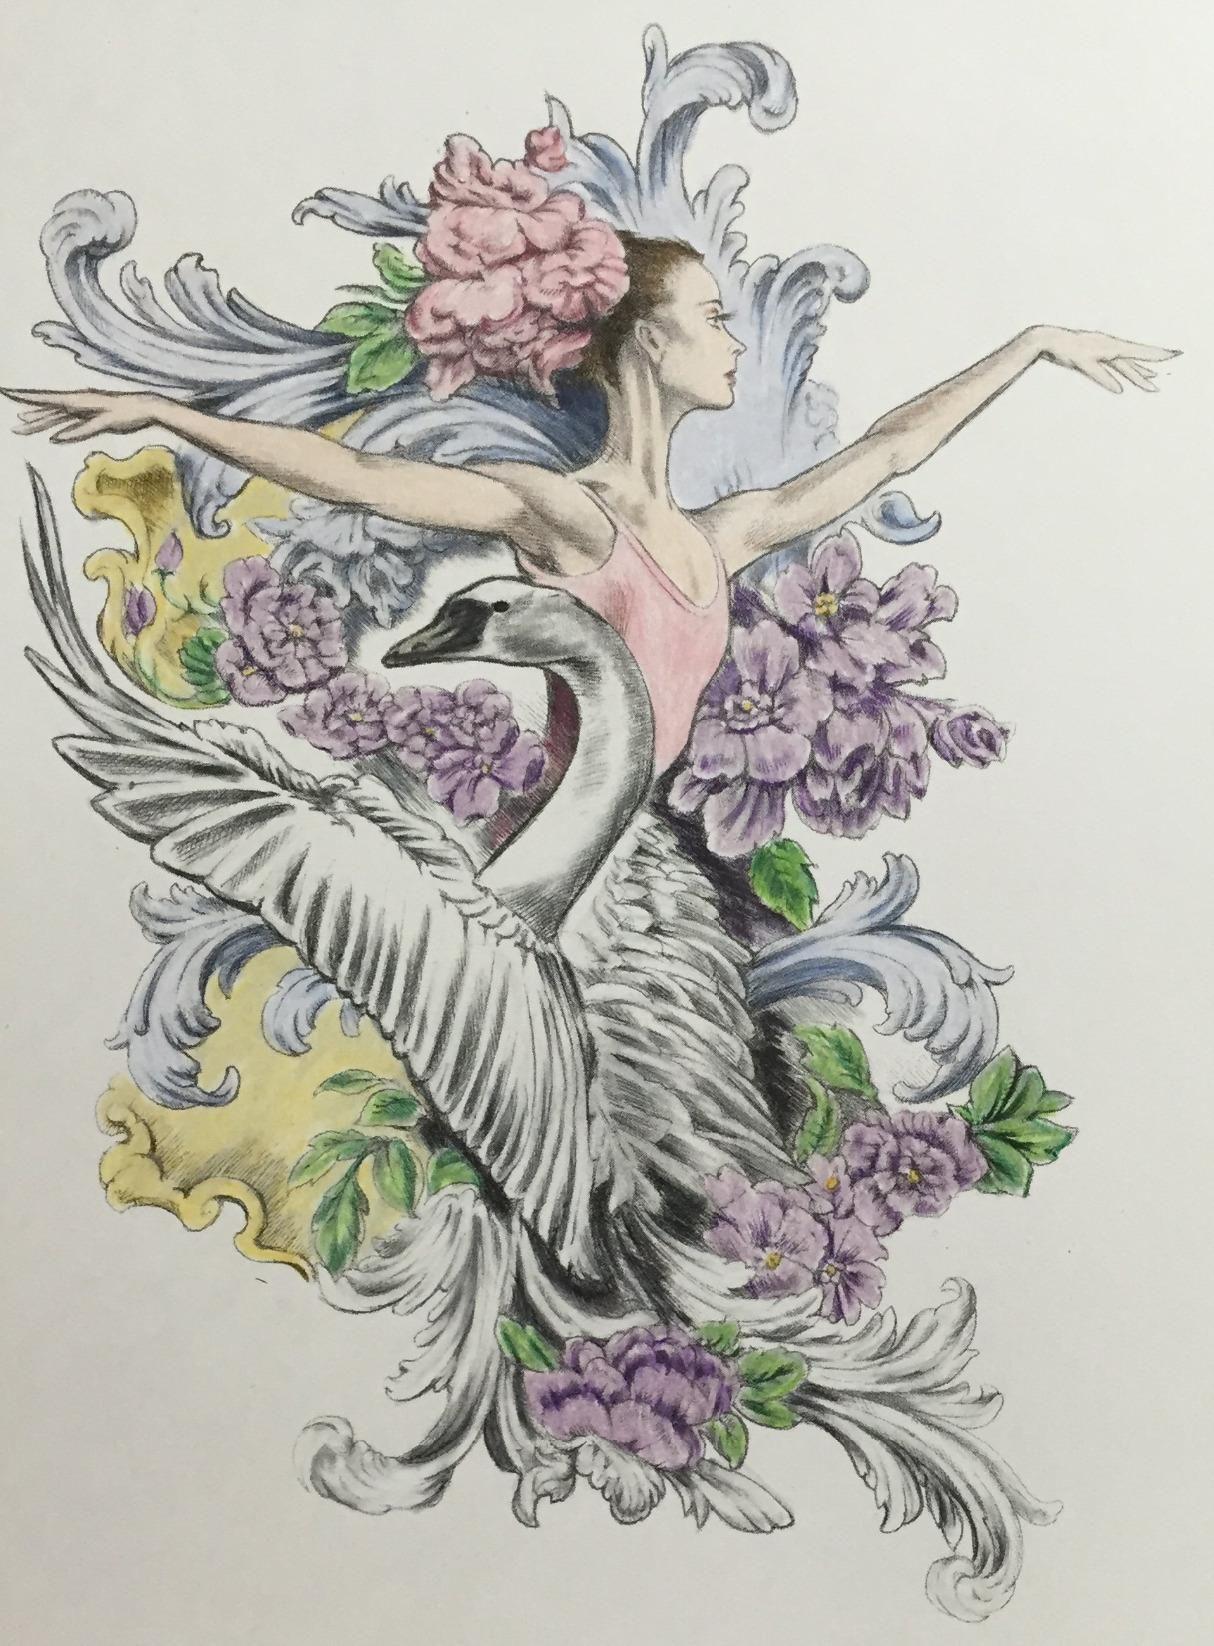 Colour book art - Amazon Com Colour My Sketchbook Adult Colouring Book 9781530189274 Mr